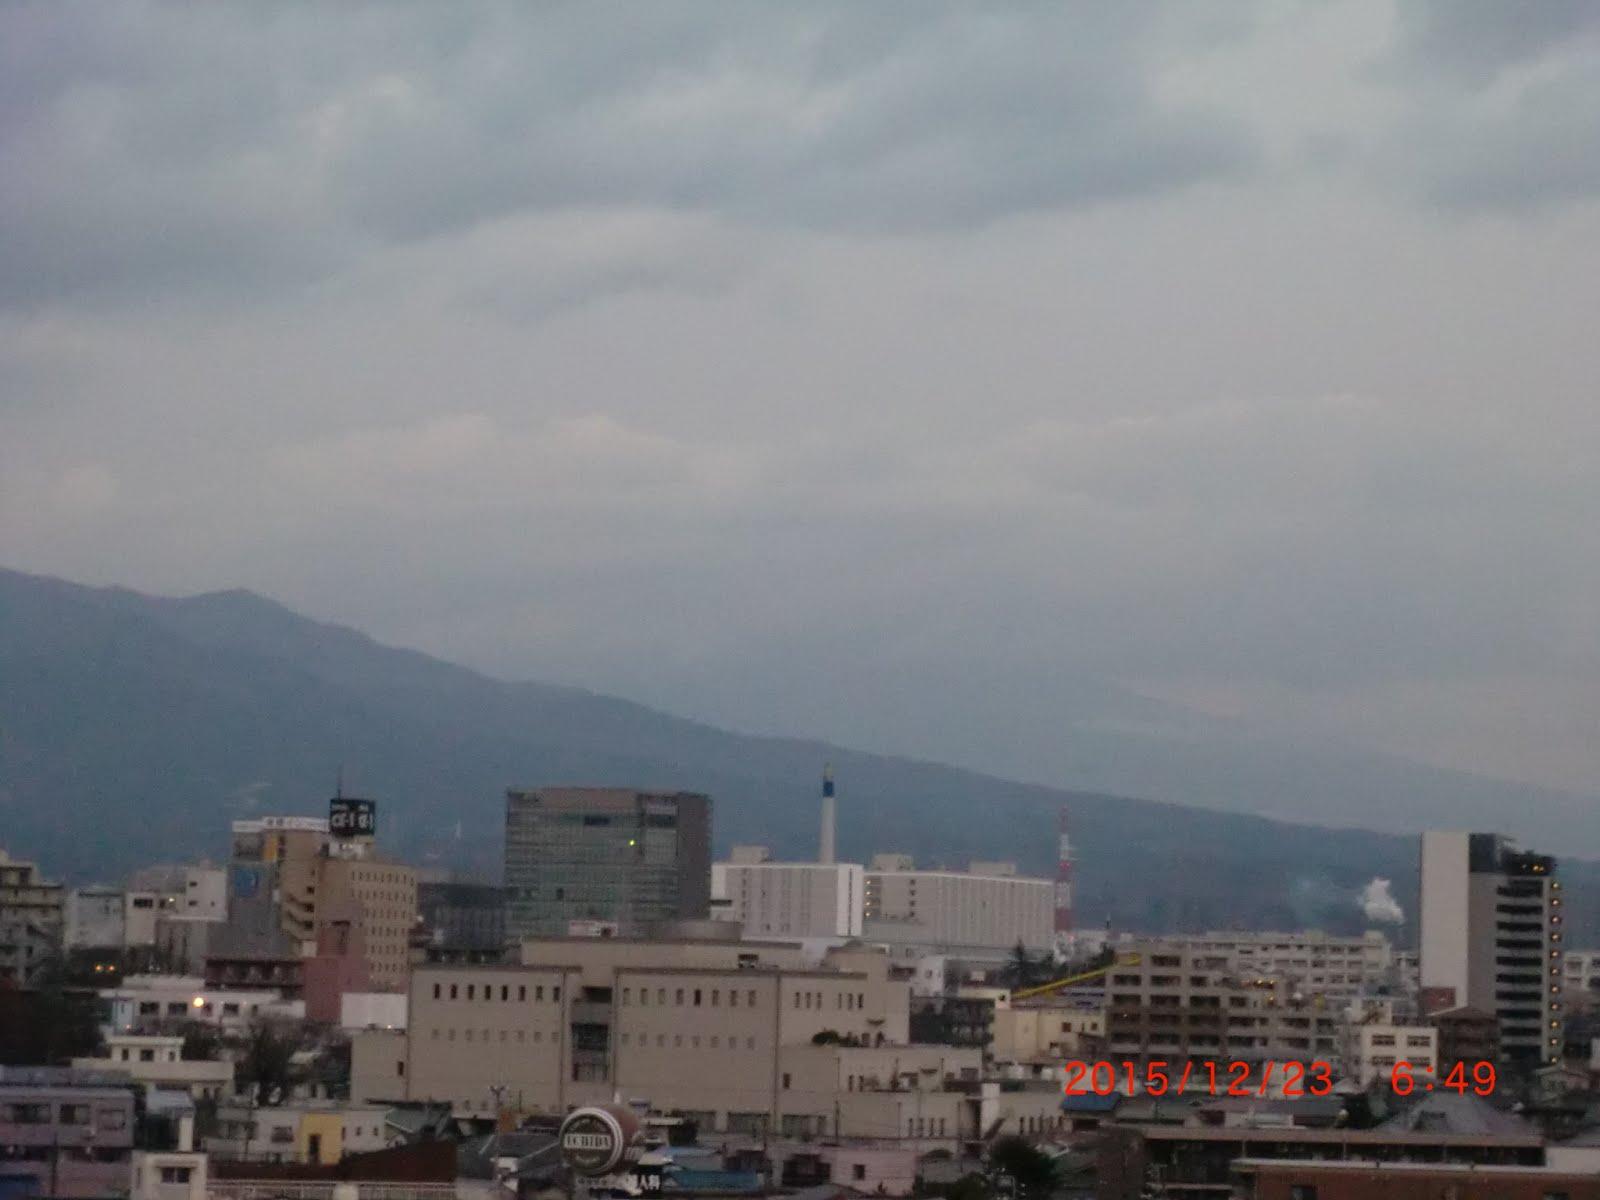 fuji 20151223